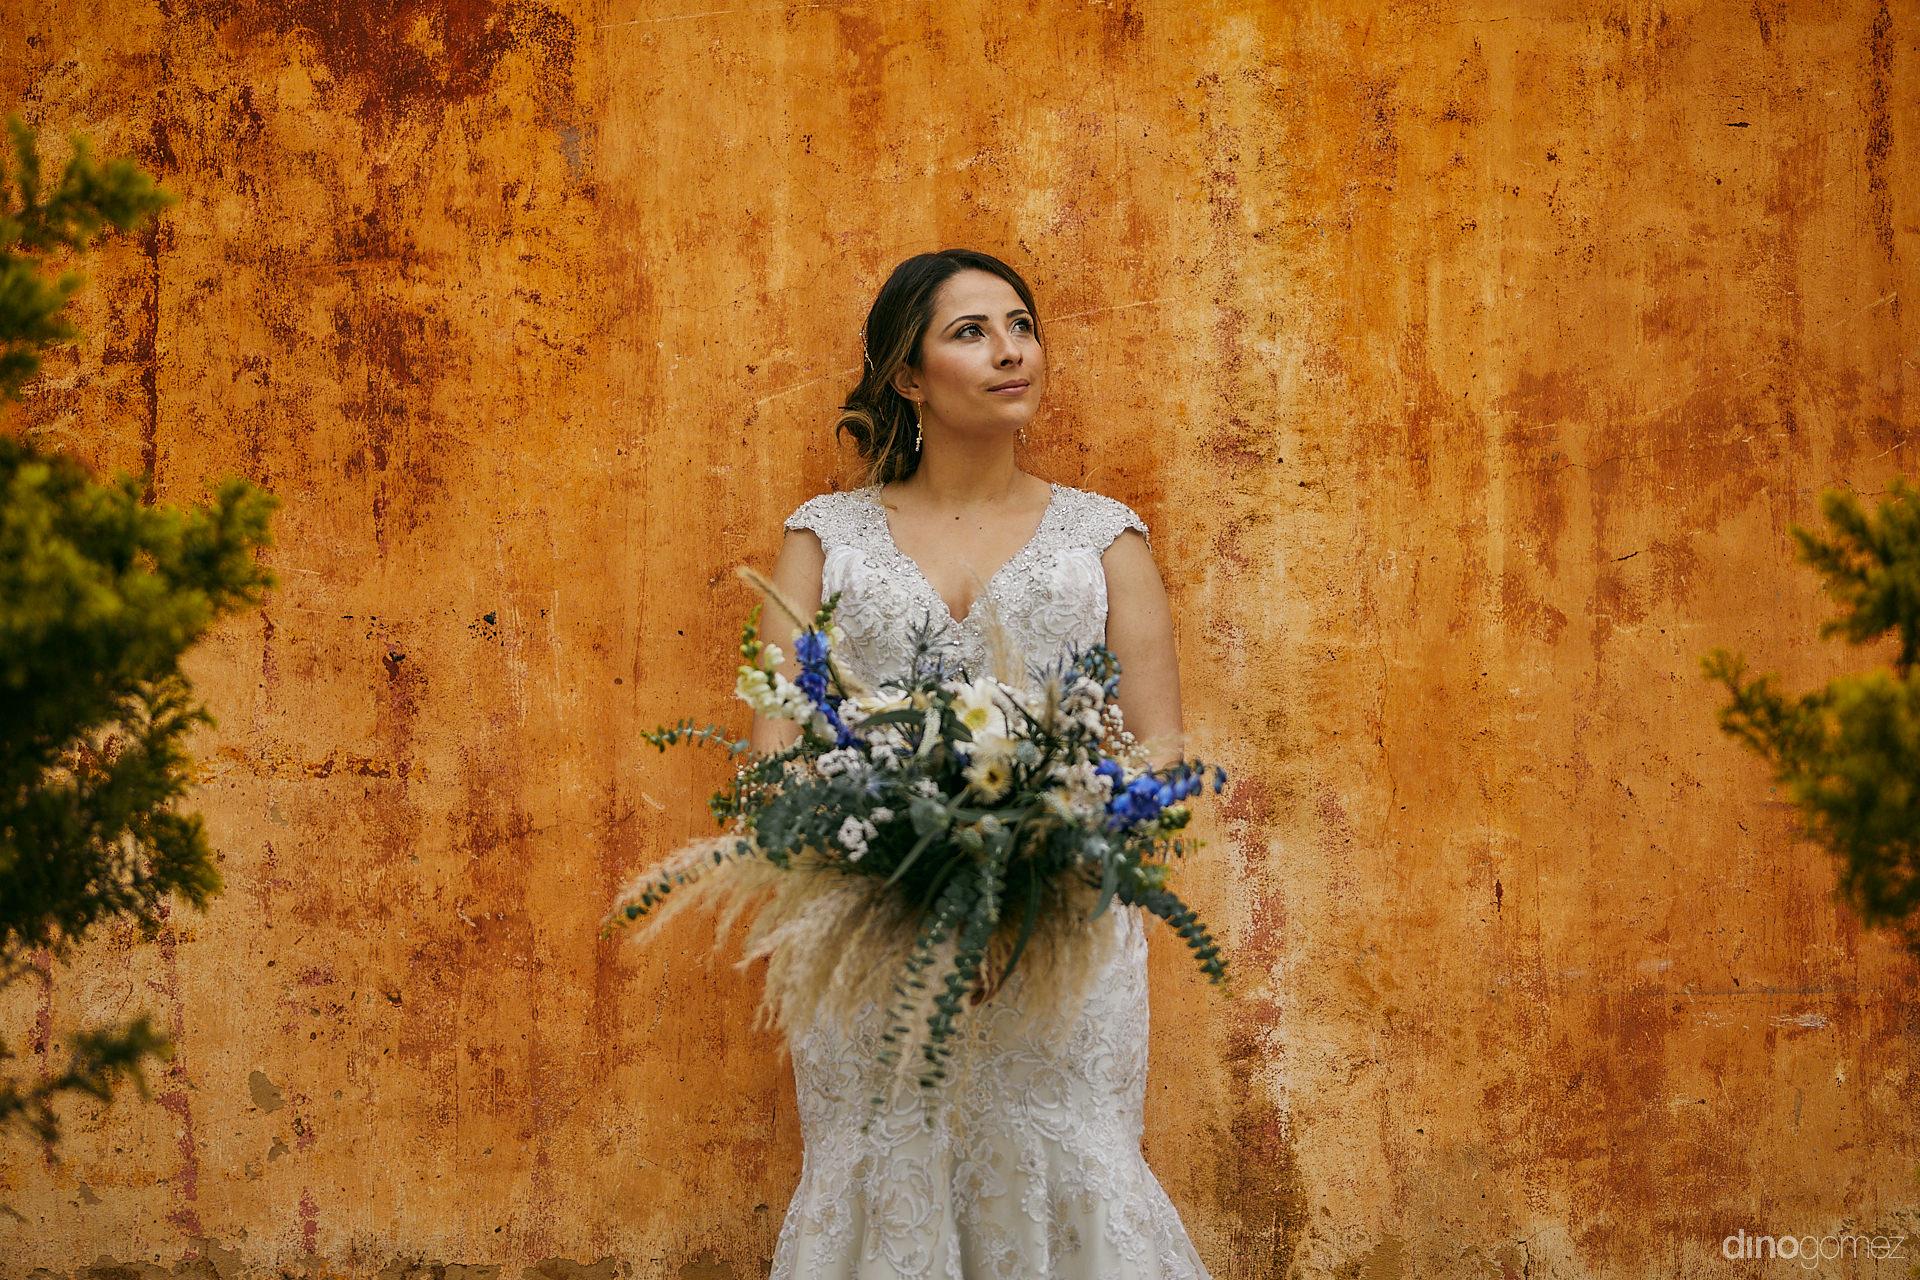 012 - Diy Budget Destination Weddings Can Be Prety Too!